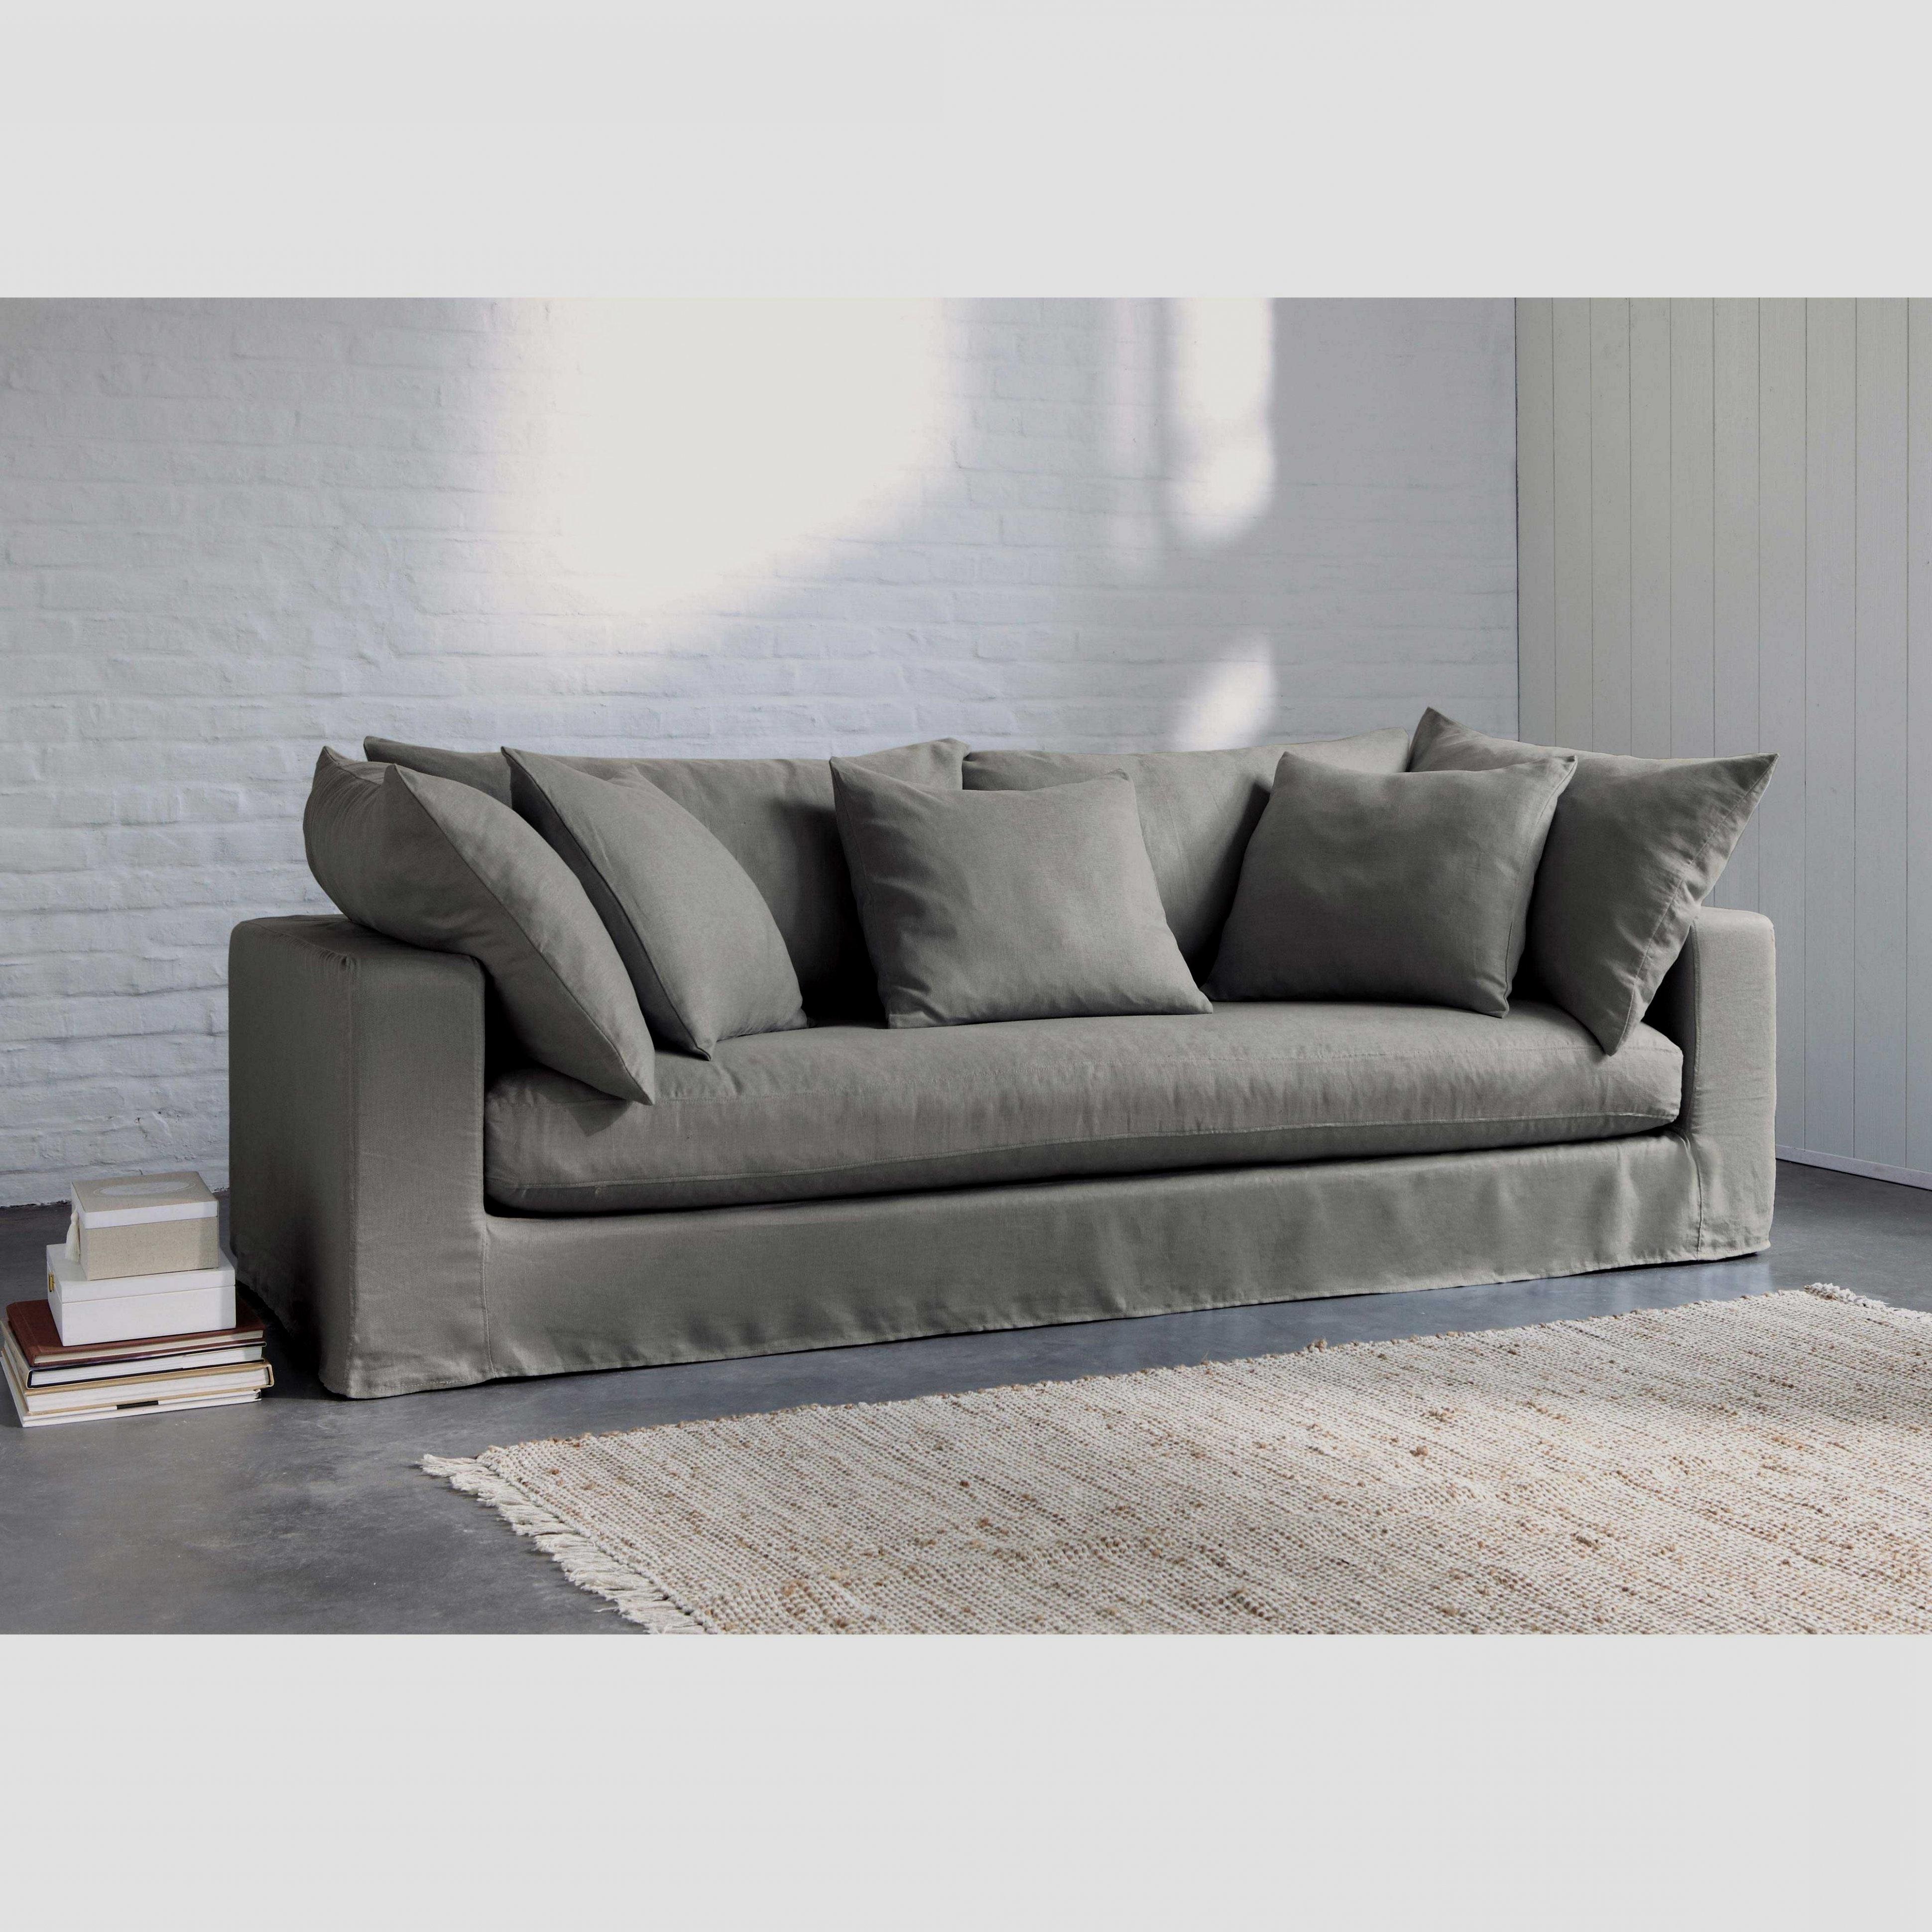 Tipos De sofas Q5df Tipos De sofas Bello 34 Elegant sofa En Ingles Busco Sillas